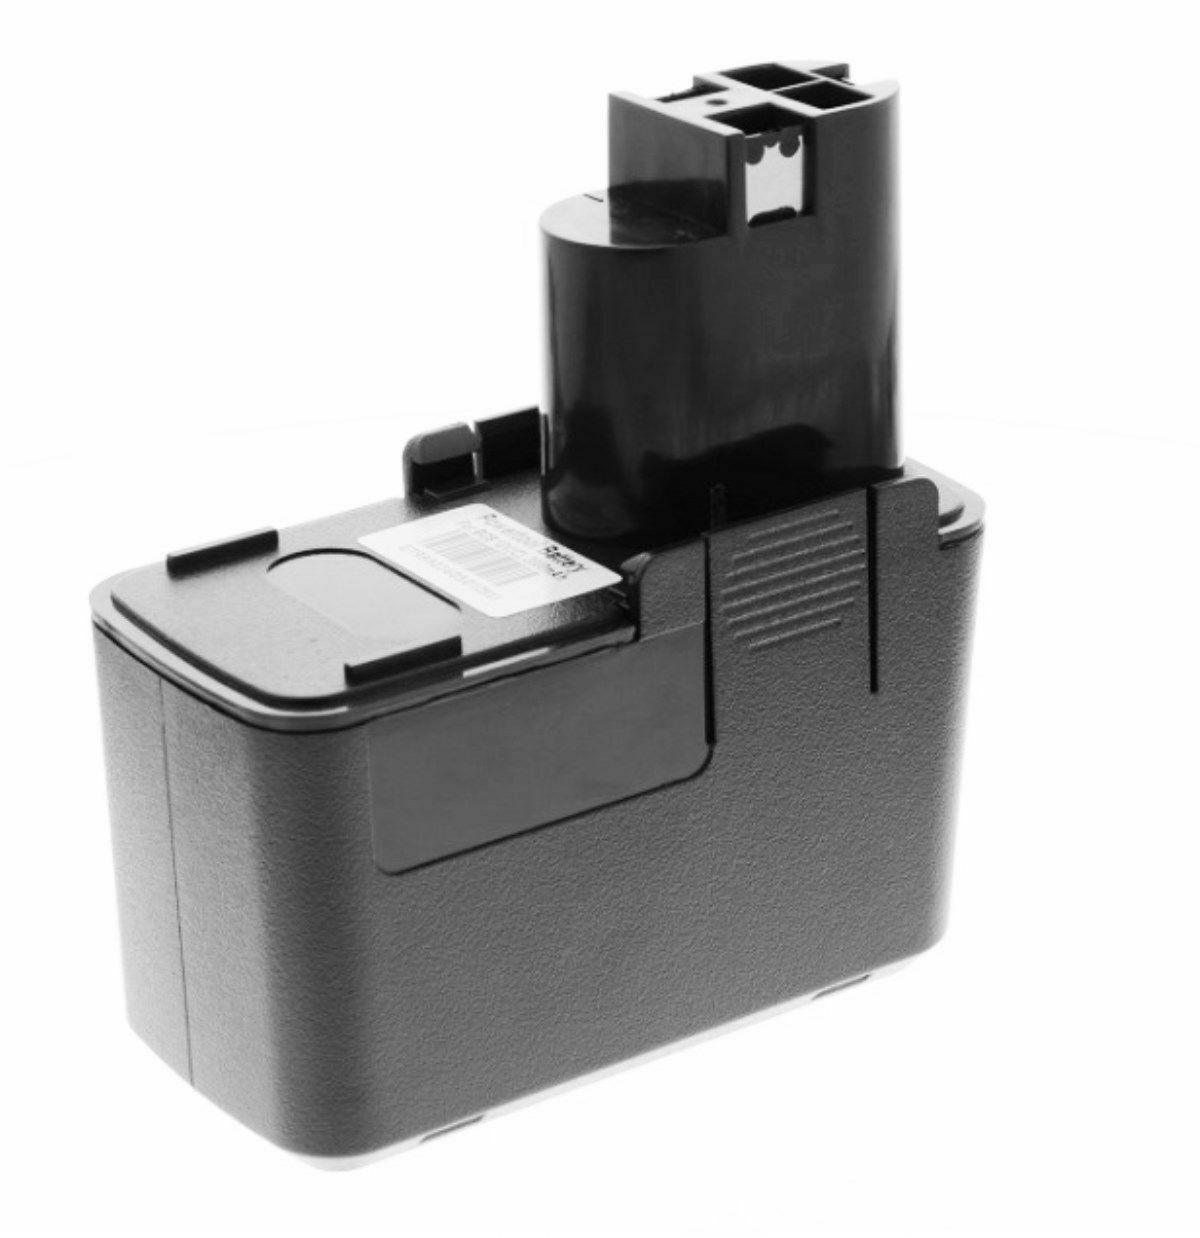 Batterie BOSCH 12V 3000mAh 2607335172,2607335185,2607335243(compatible)